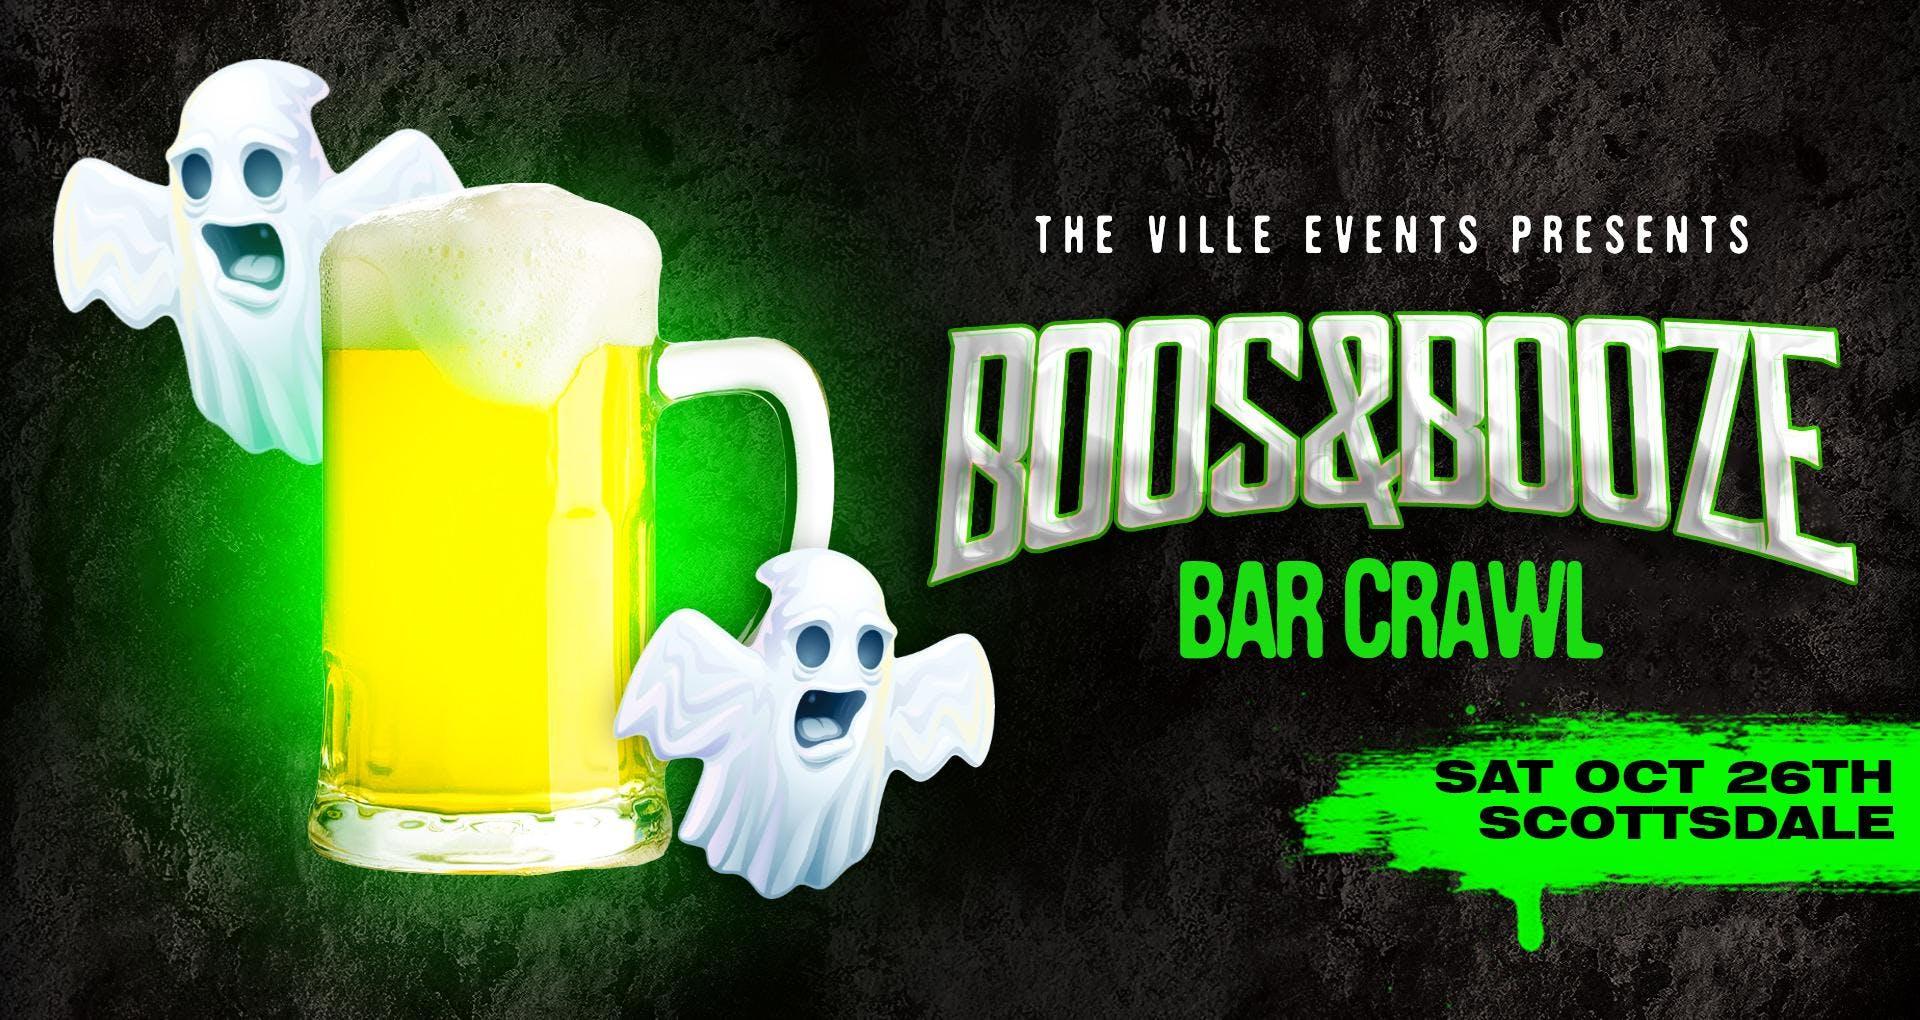 Boos & Booze Bar Crawl - Scottsdale, AZ - October 26th